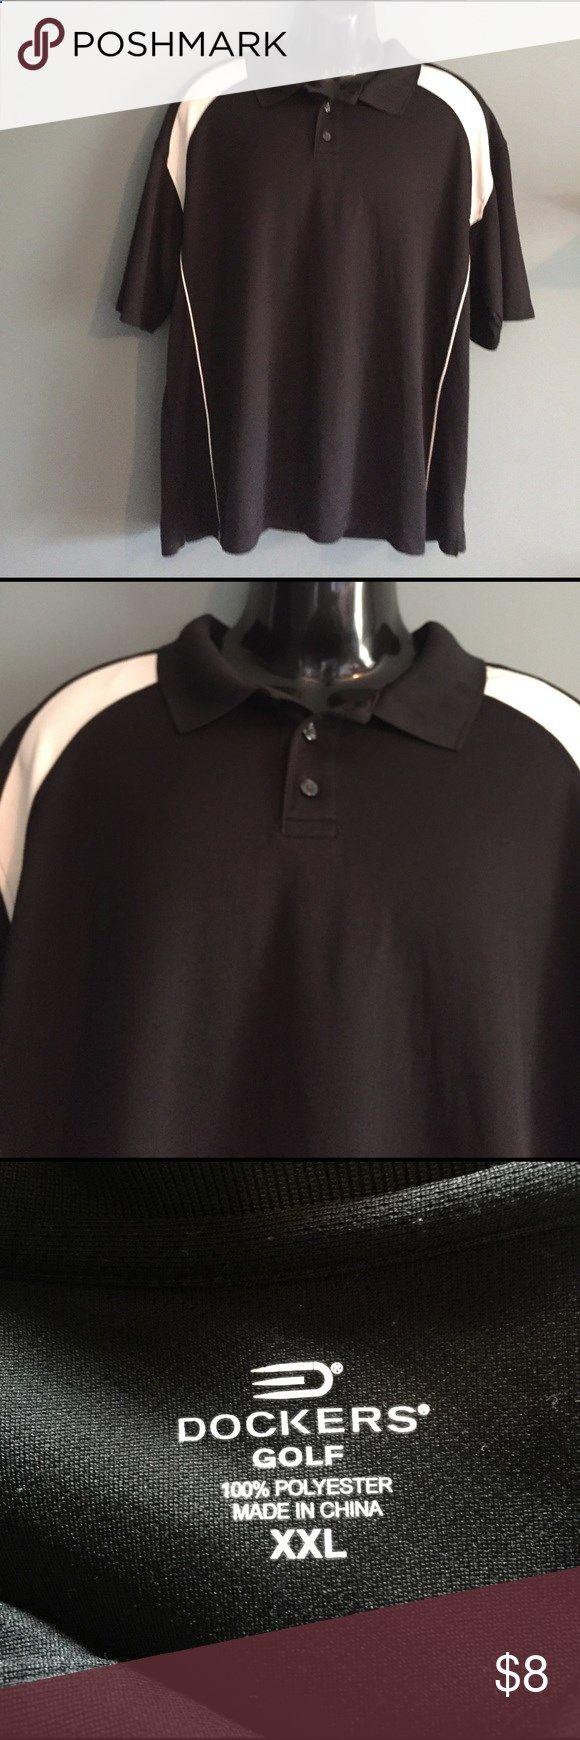 Golf Shirts - Mens Dockers Golf shirt Mens Dockers golf shirt. In good condition. XXL. Dockers Shirts Polos